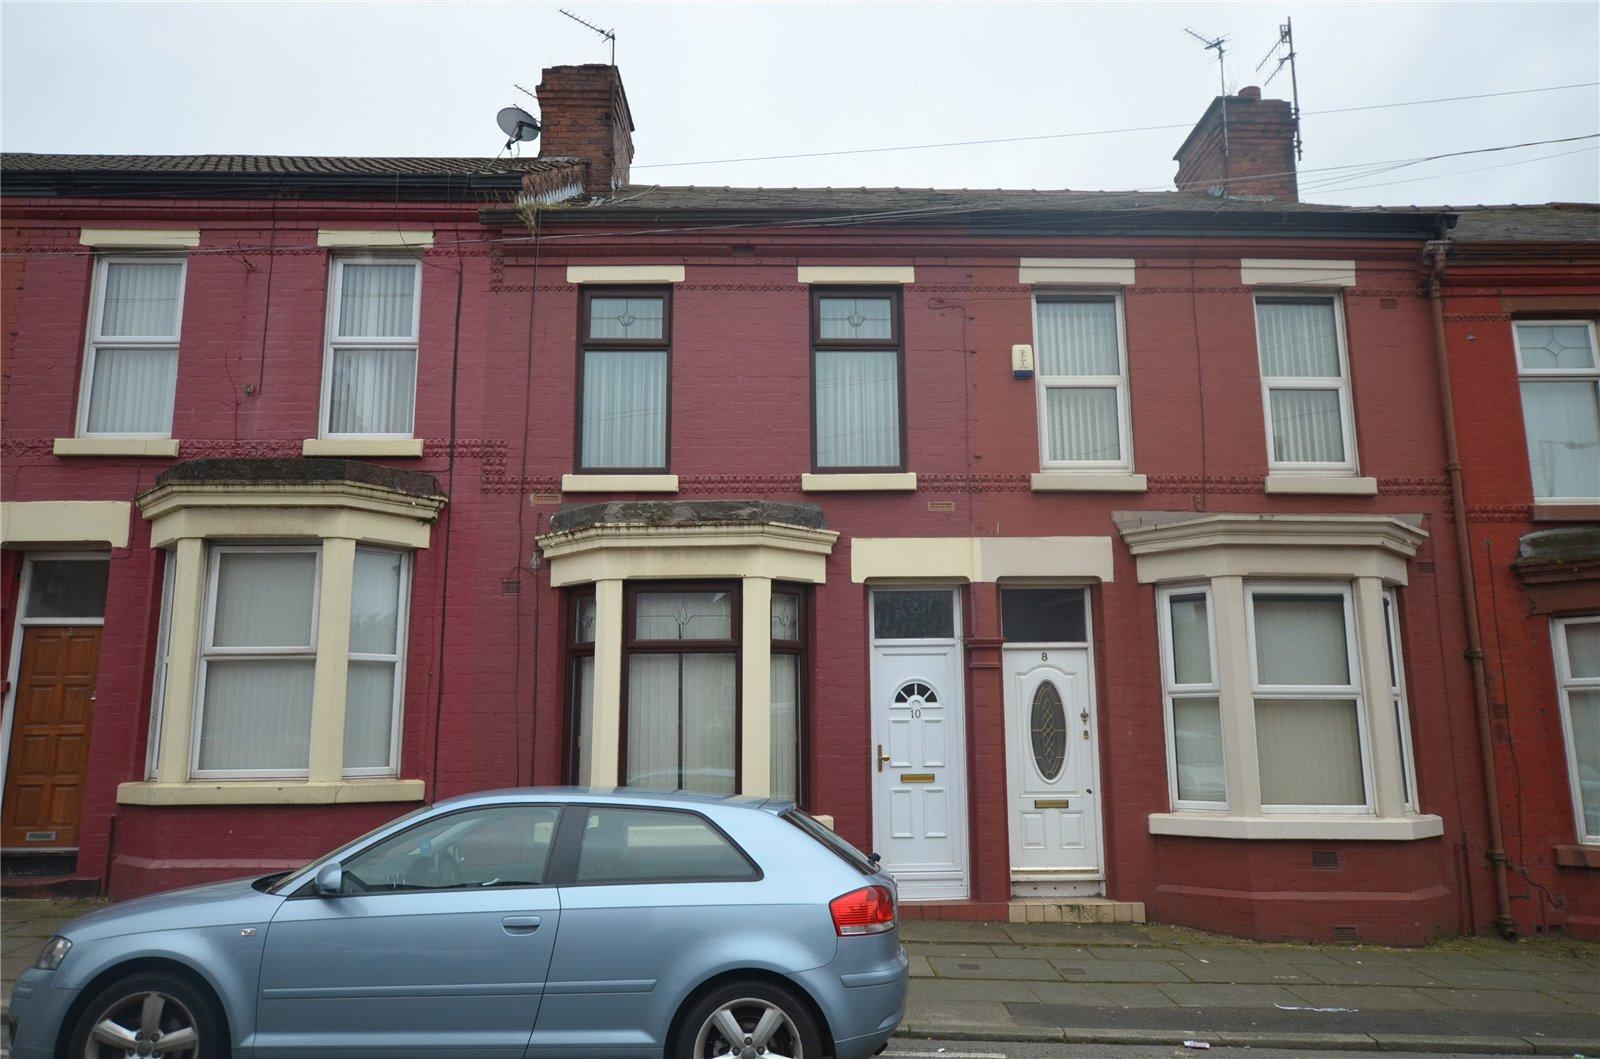 2 Bedrooms Terraced House for sale in Rumney Road West, Liverpool, Merseyside, L4